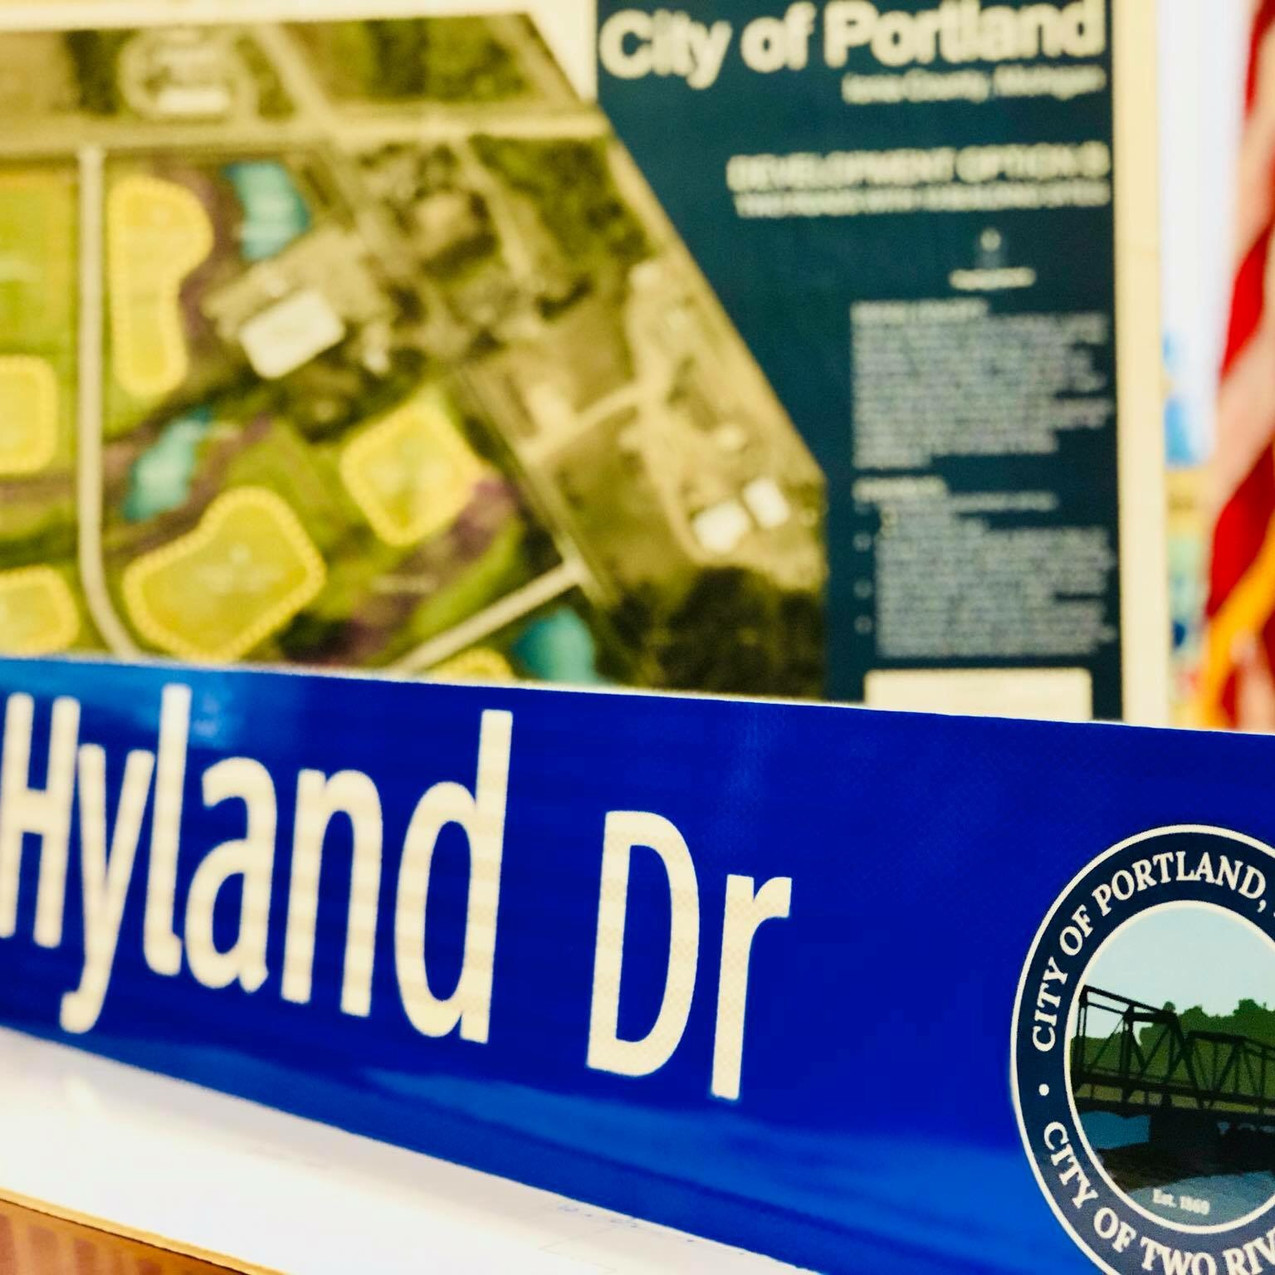 Hyland Drive